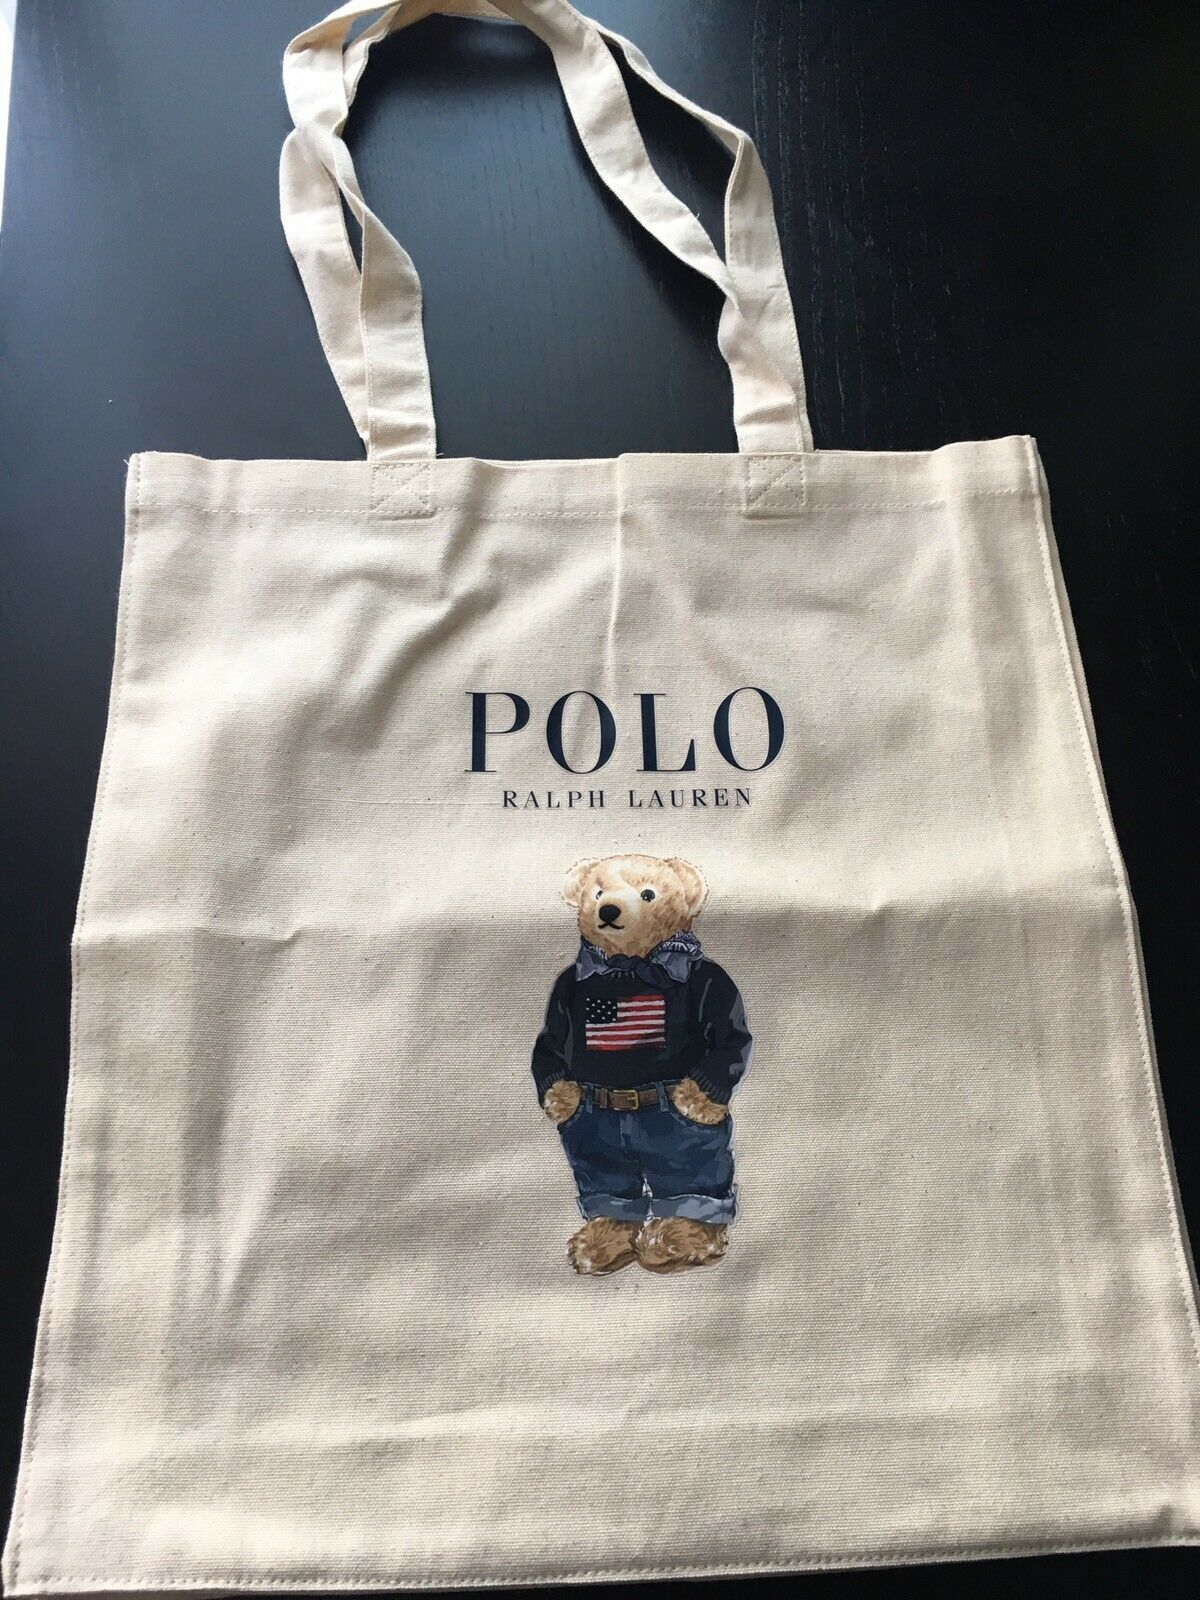 Polo Ralph Lauren Shopping Canvas Bag New